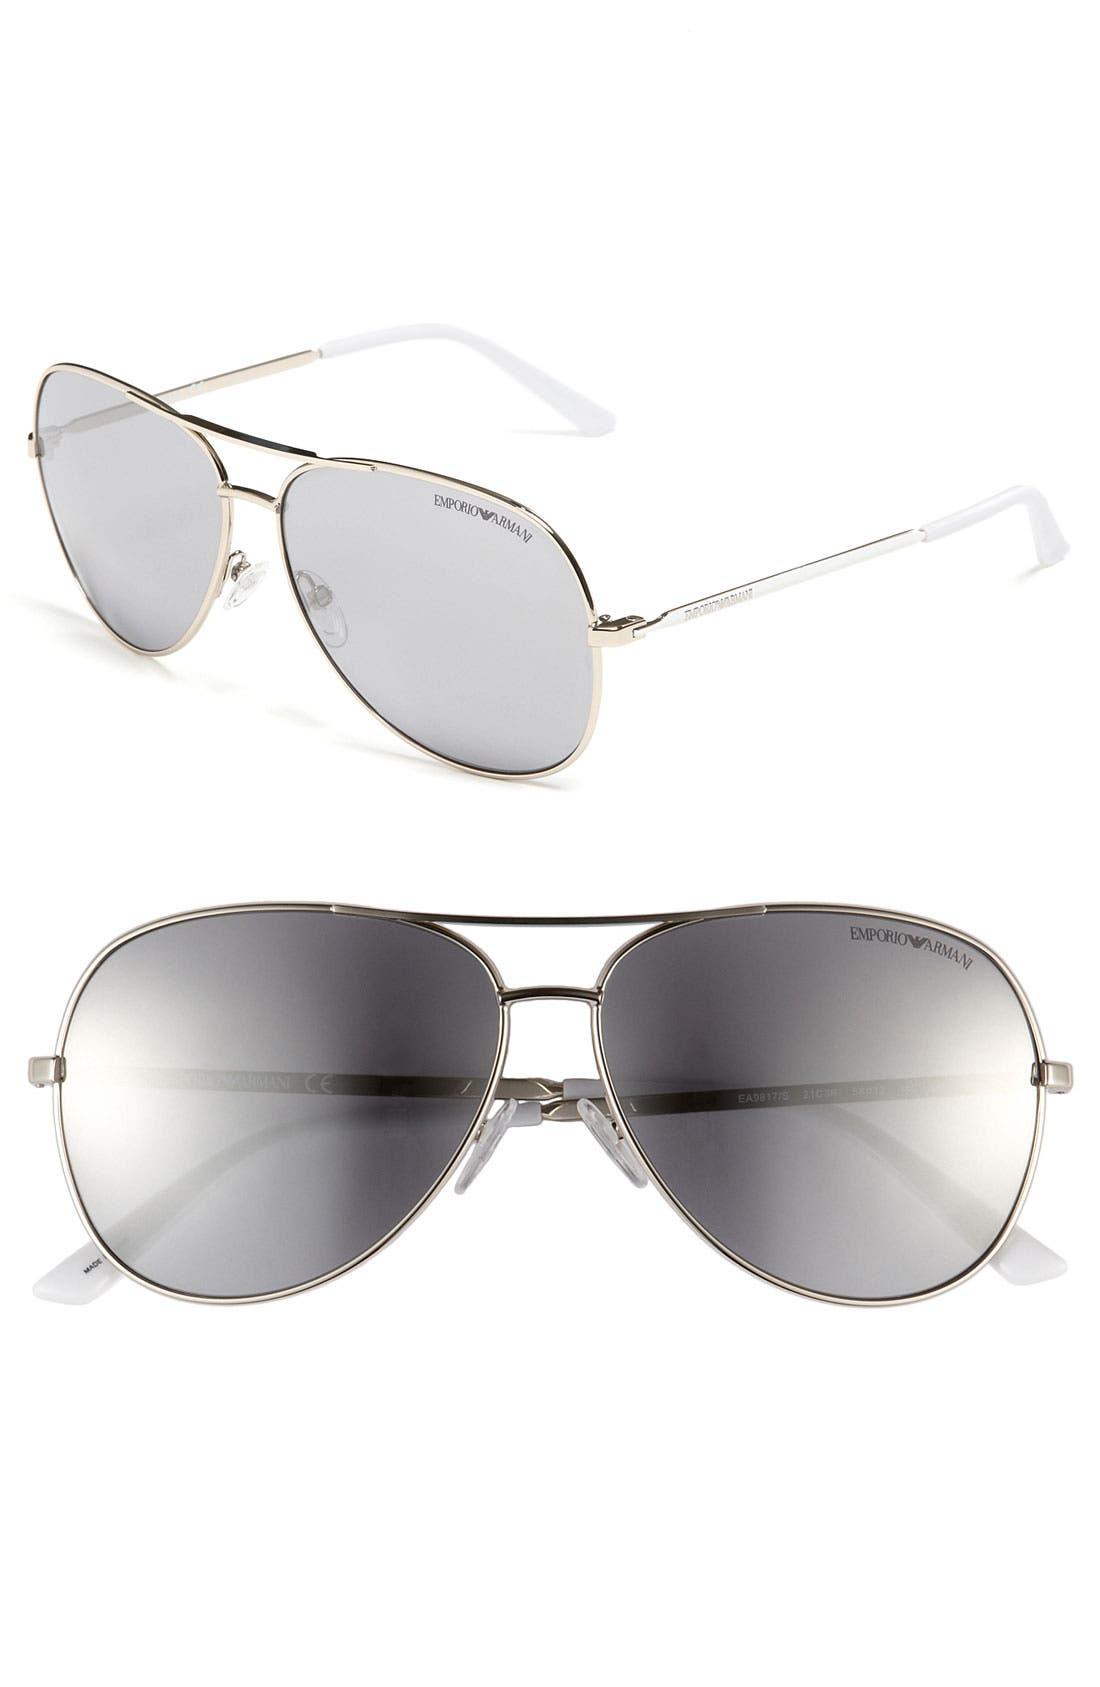 Alternate Image 1 Selected - Emporio Armani Metal Aviator Sunglasses